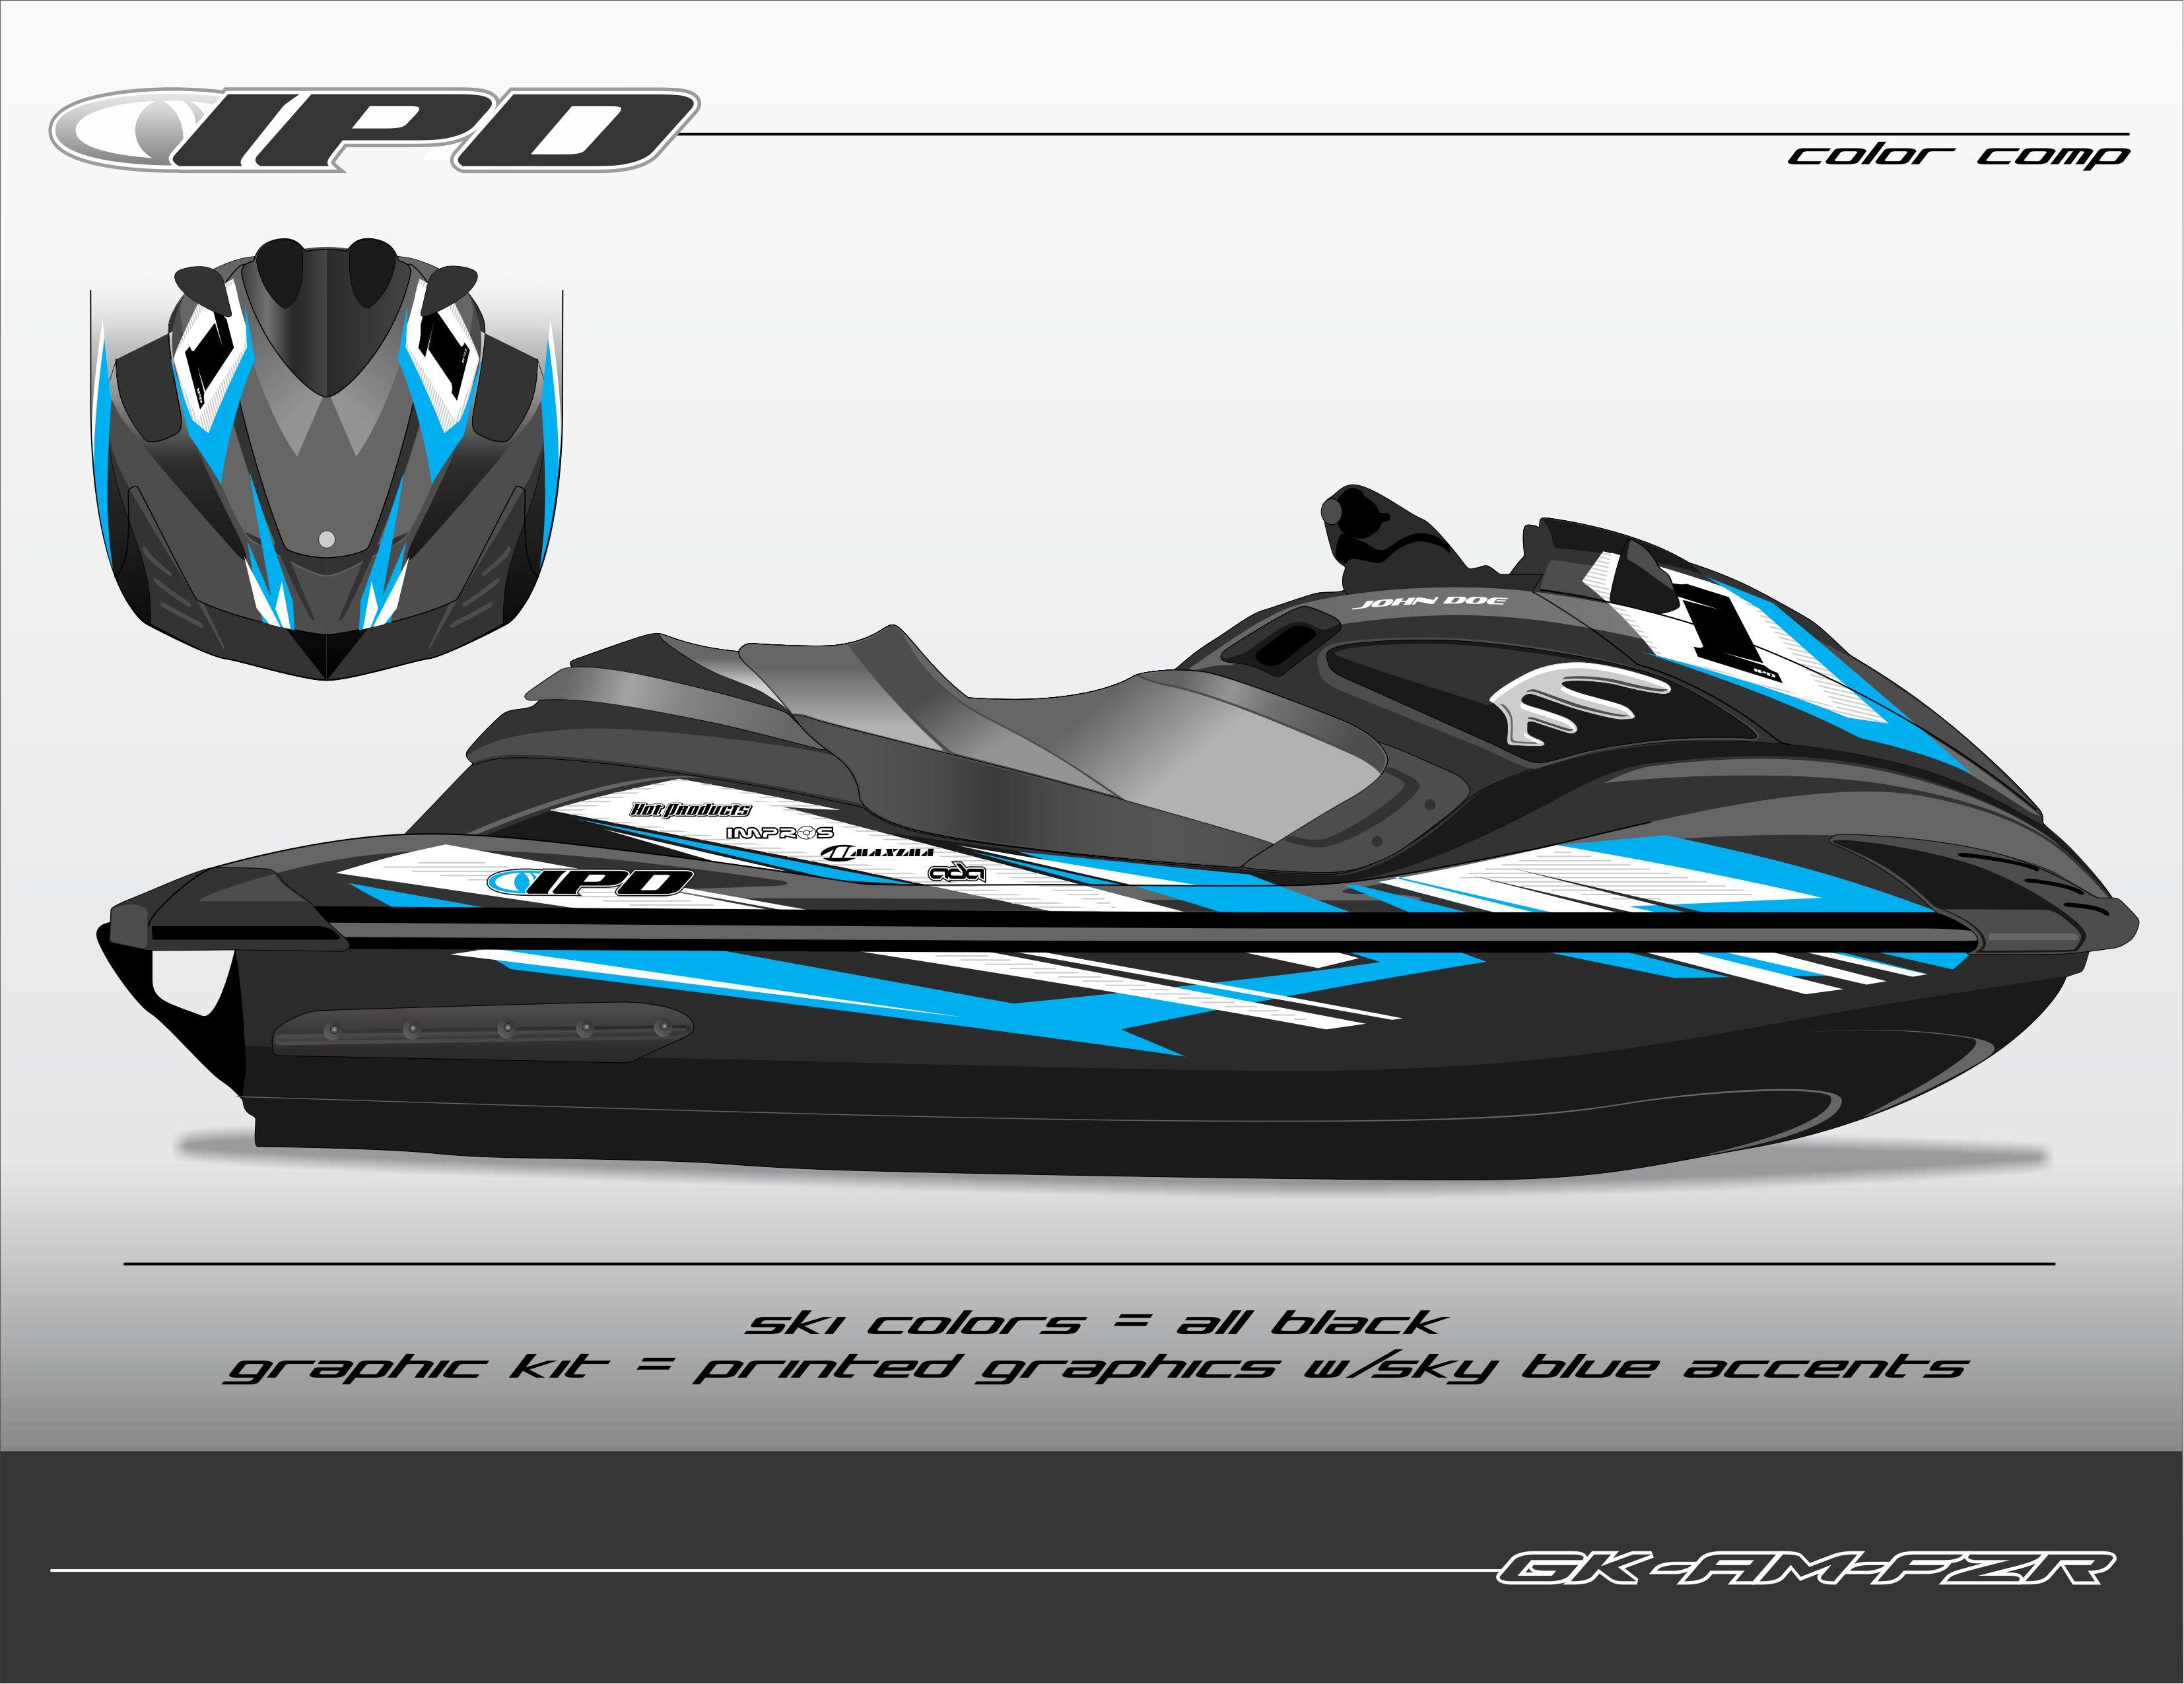 yamaha fzs fzr graphics kit am design ipd jet ski. Black Bedroom Furniture Sets. Home Design Ideas